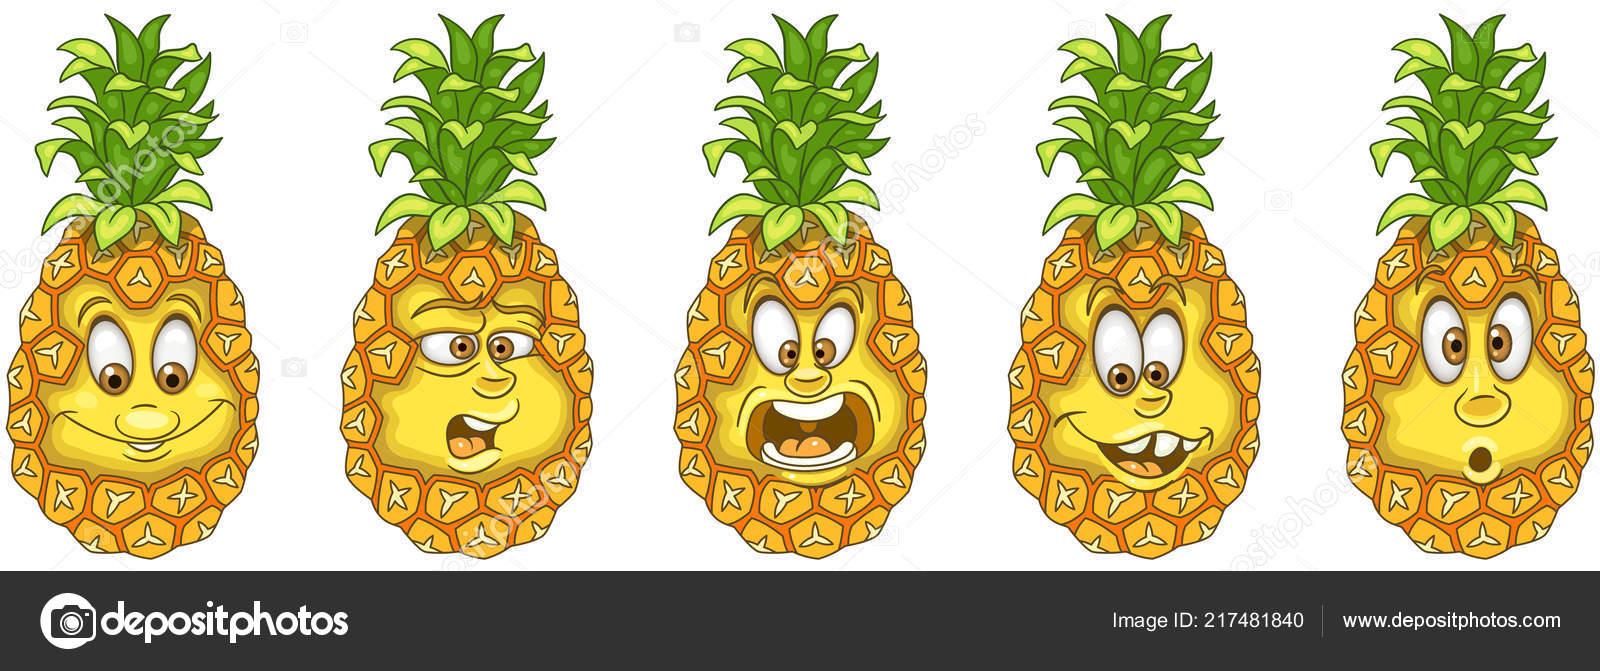 Coloriage Pomme Et Oignon Dessin Anime.Ananas Concept Gout Fruits Collection Emoticones Emoji